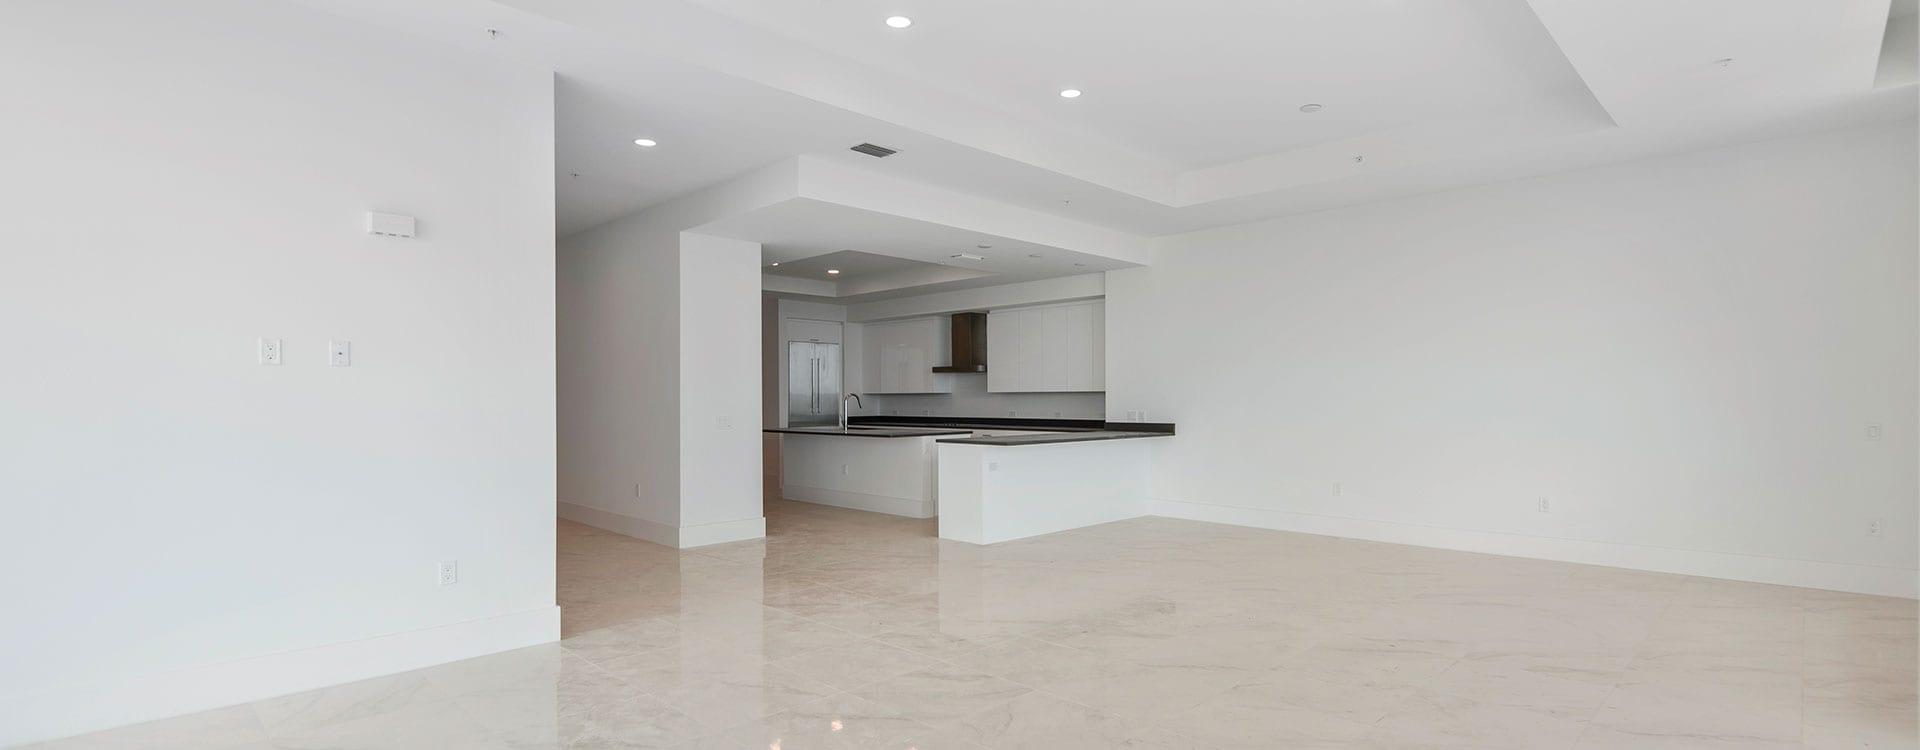 BLVD Sarasota Residence 1102 Great Room